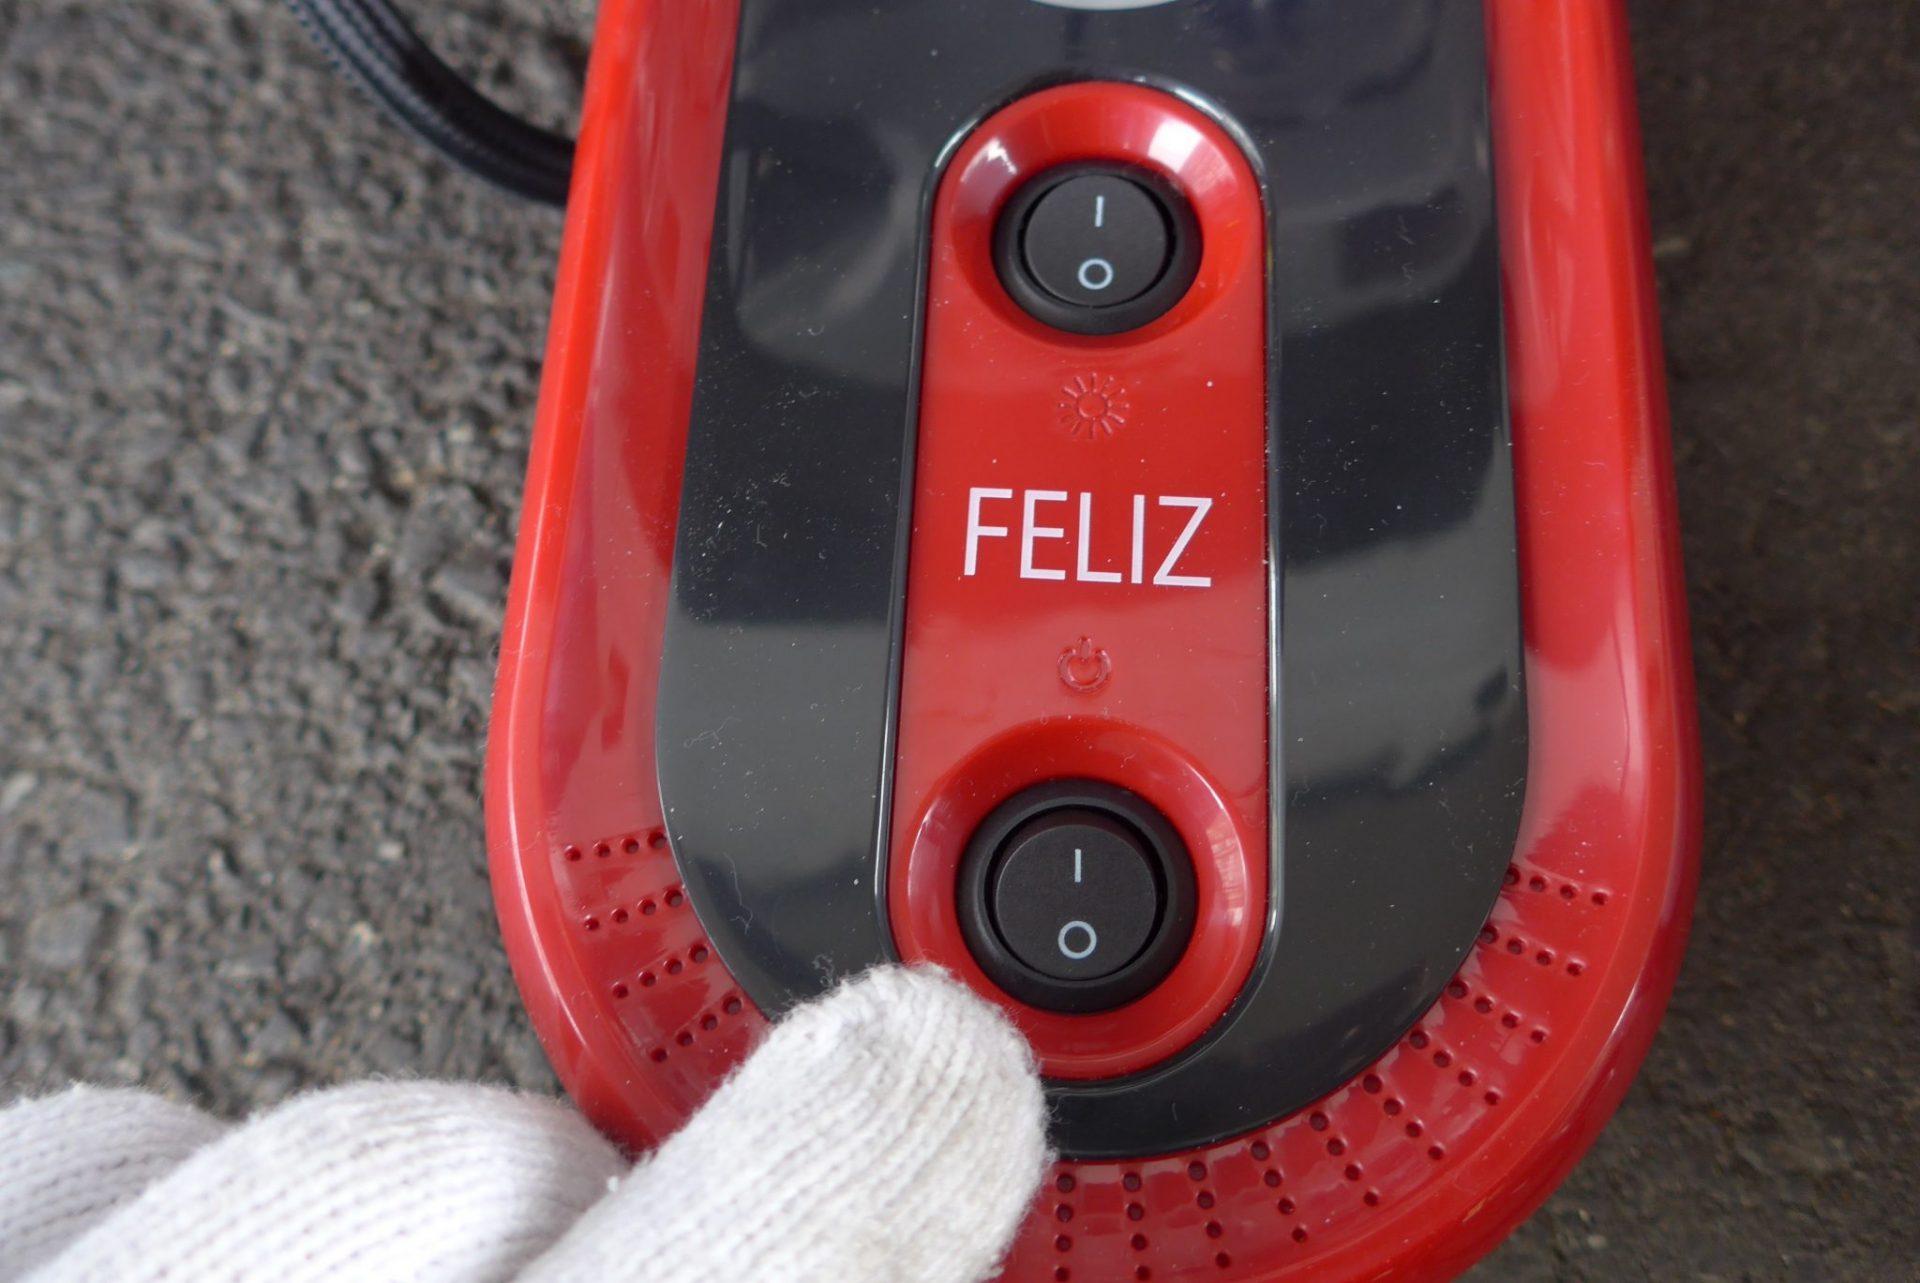 (K)FELIZ車用空気入れエアコンプレッサーはとっても便利!